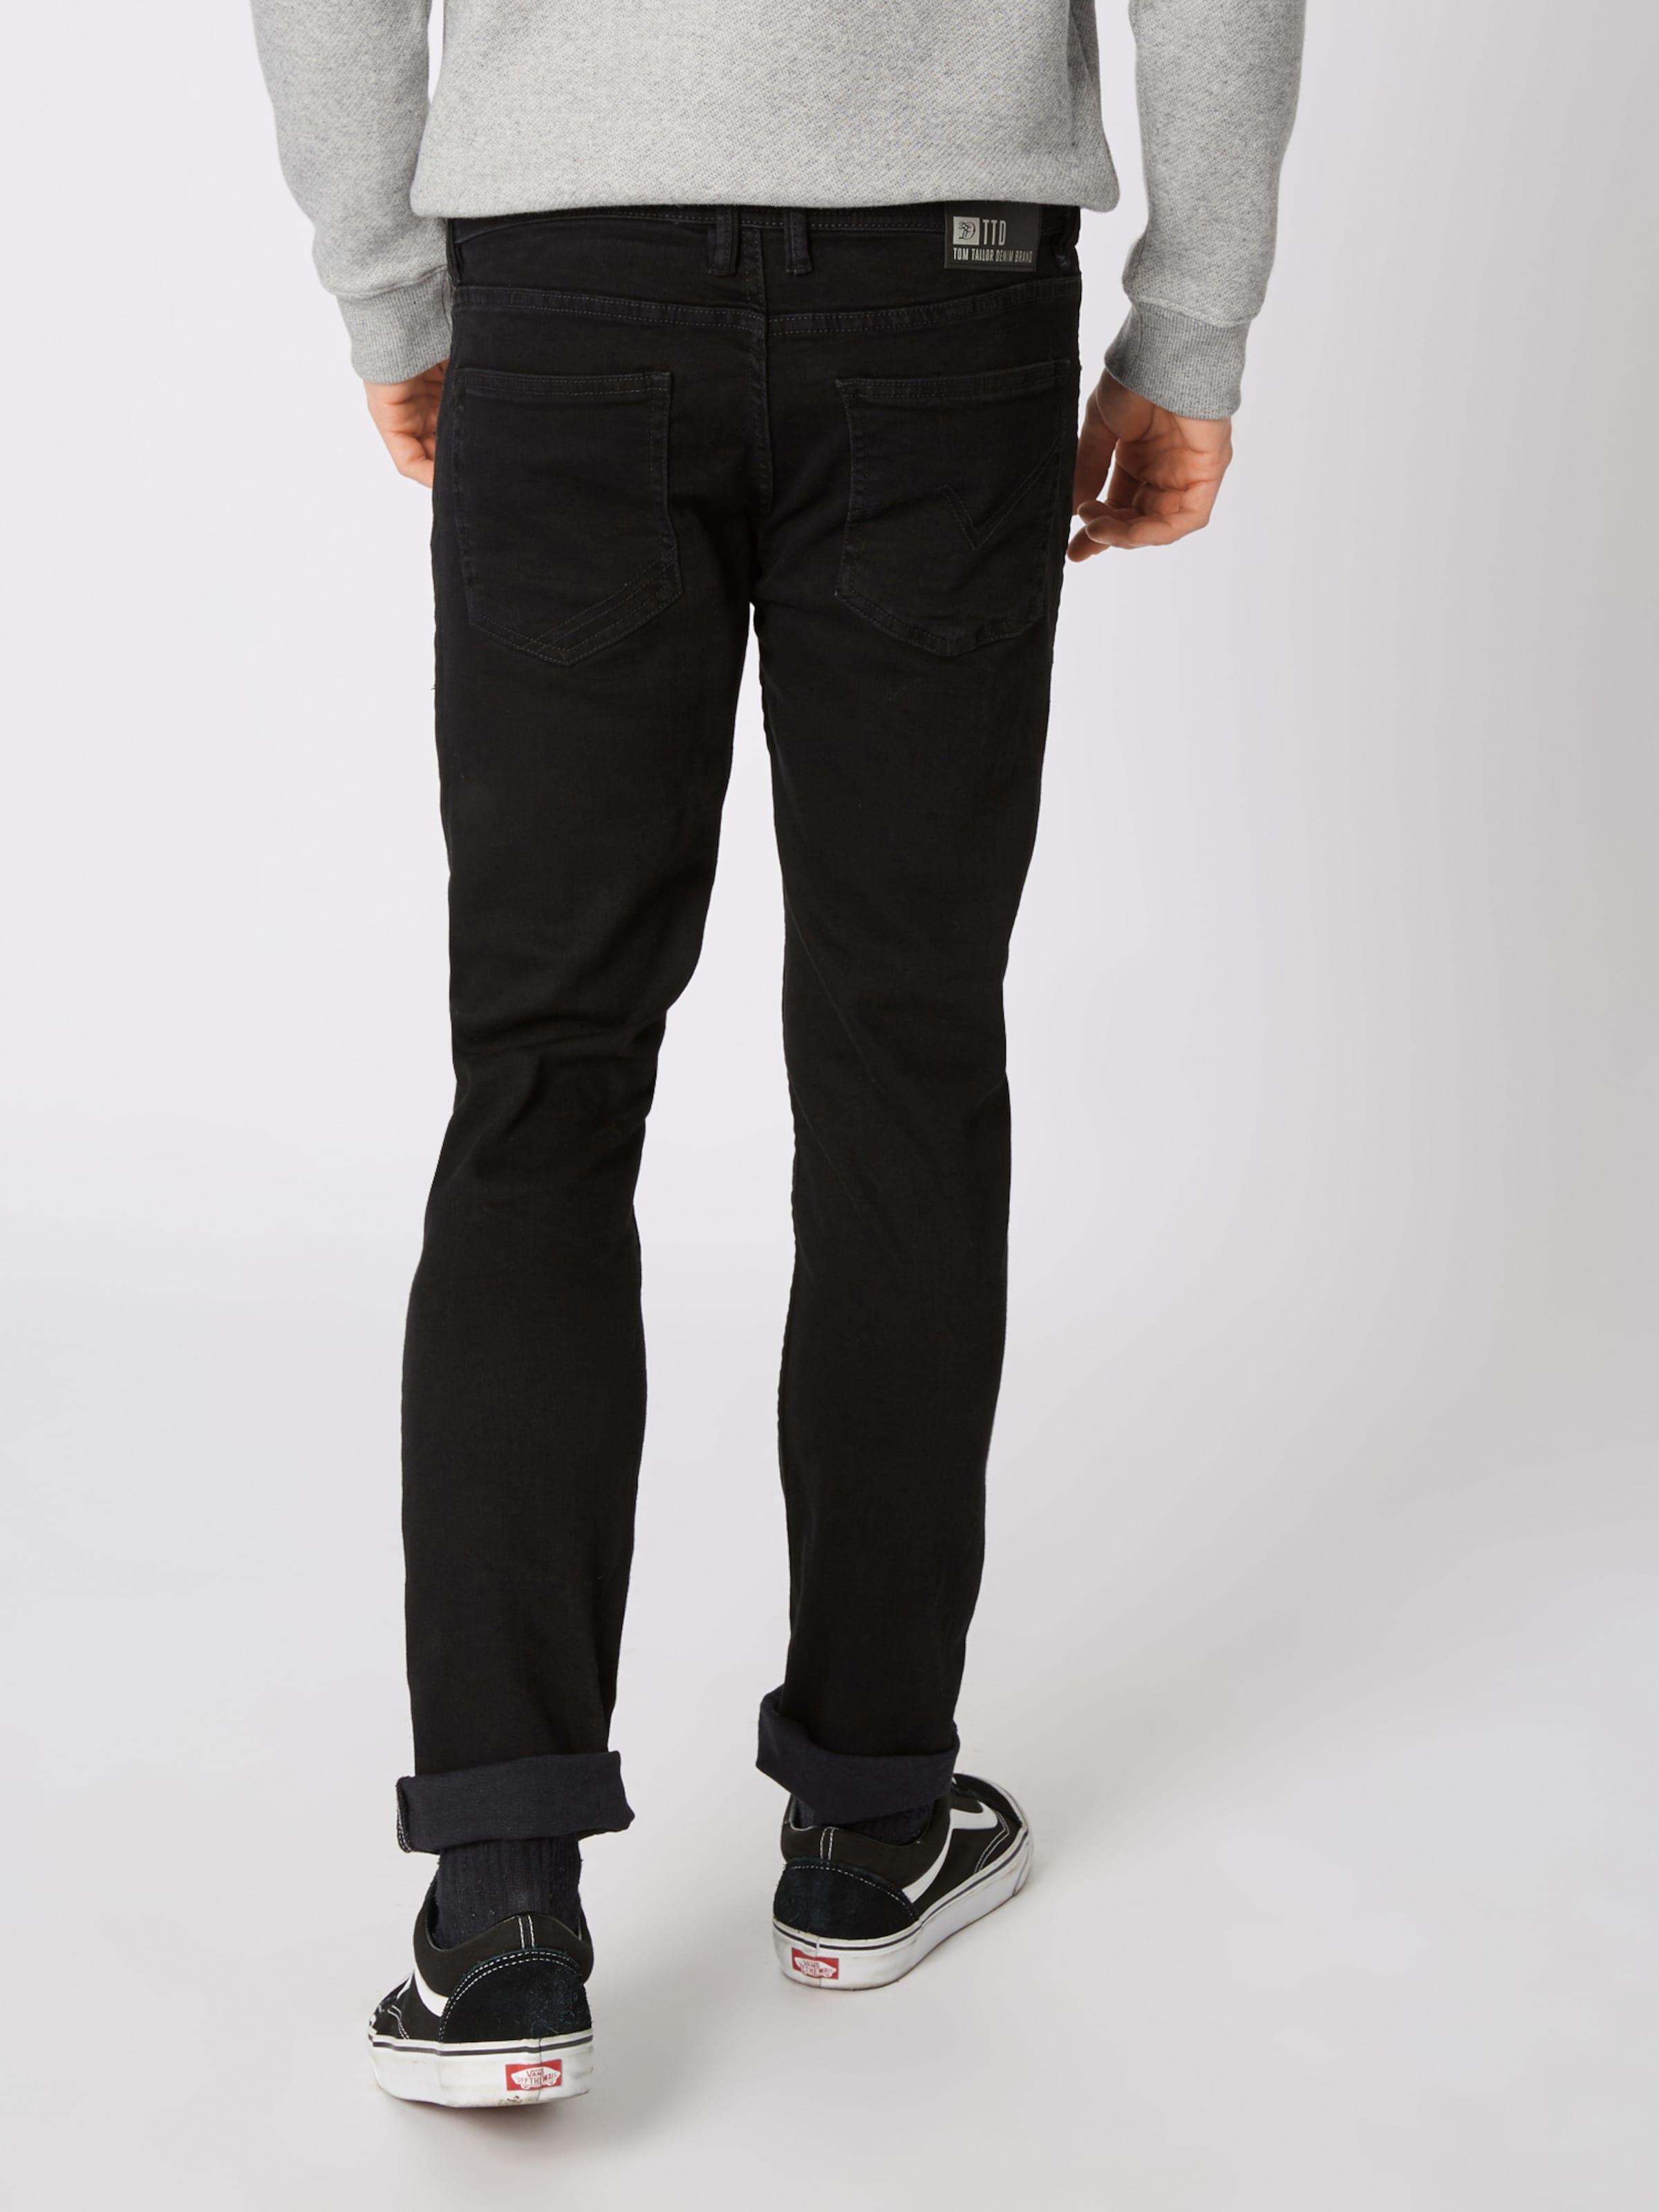 'piers' Jeans Tom Denim In Tailor Black OukXTZiP